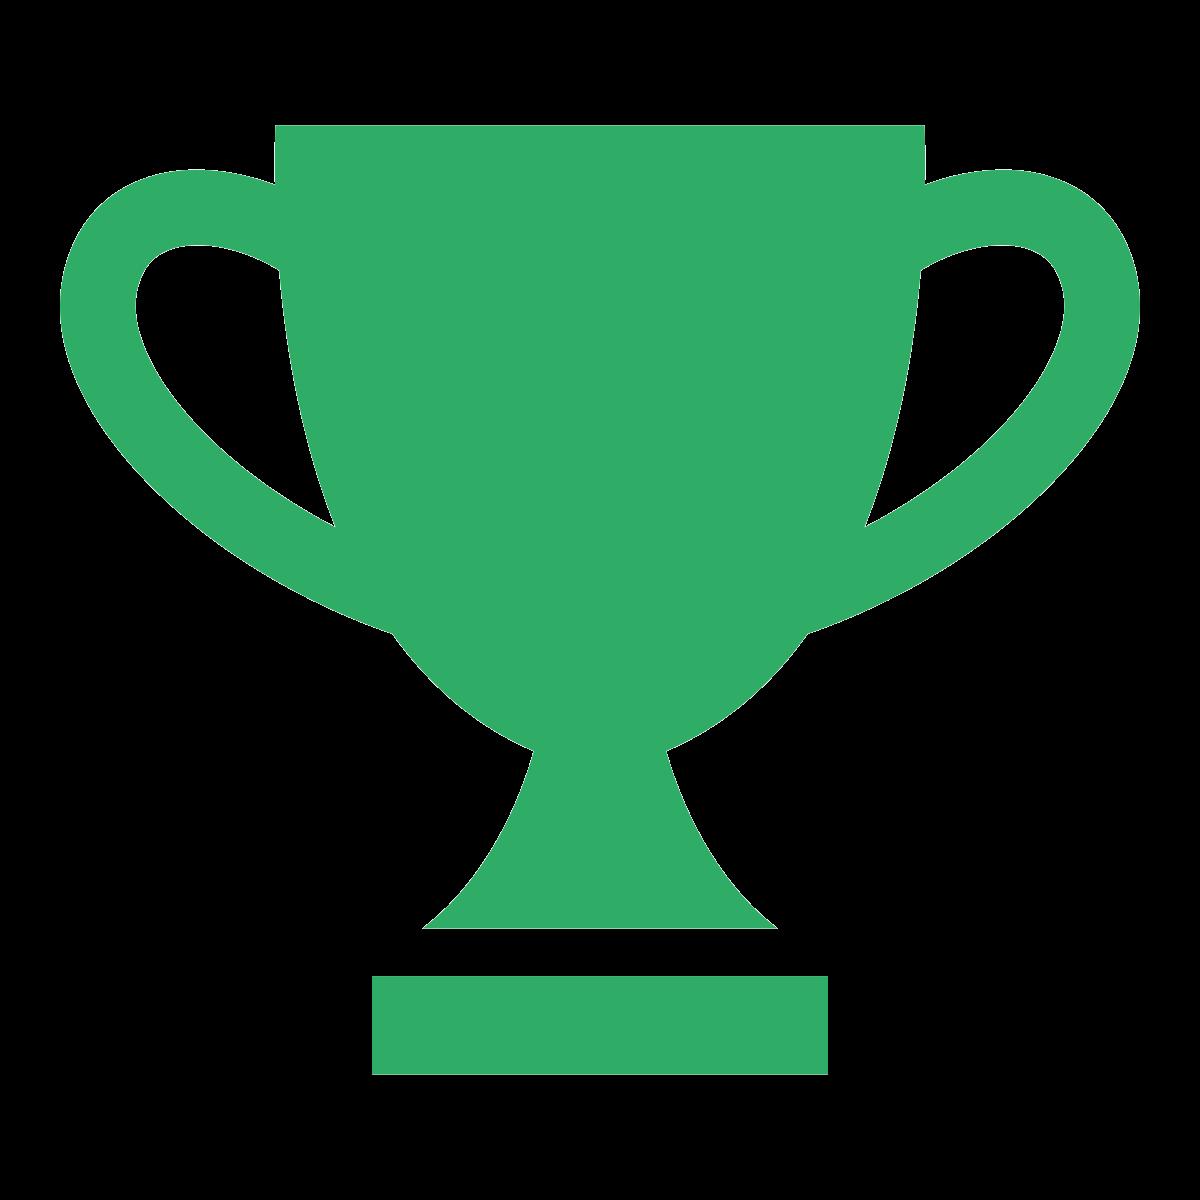 noun_Trophy_355128_2fac66